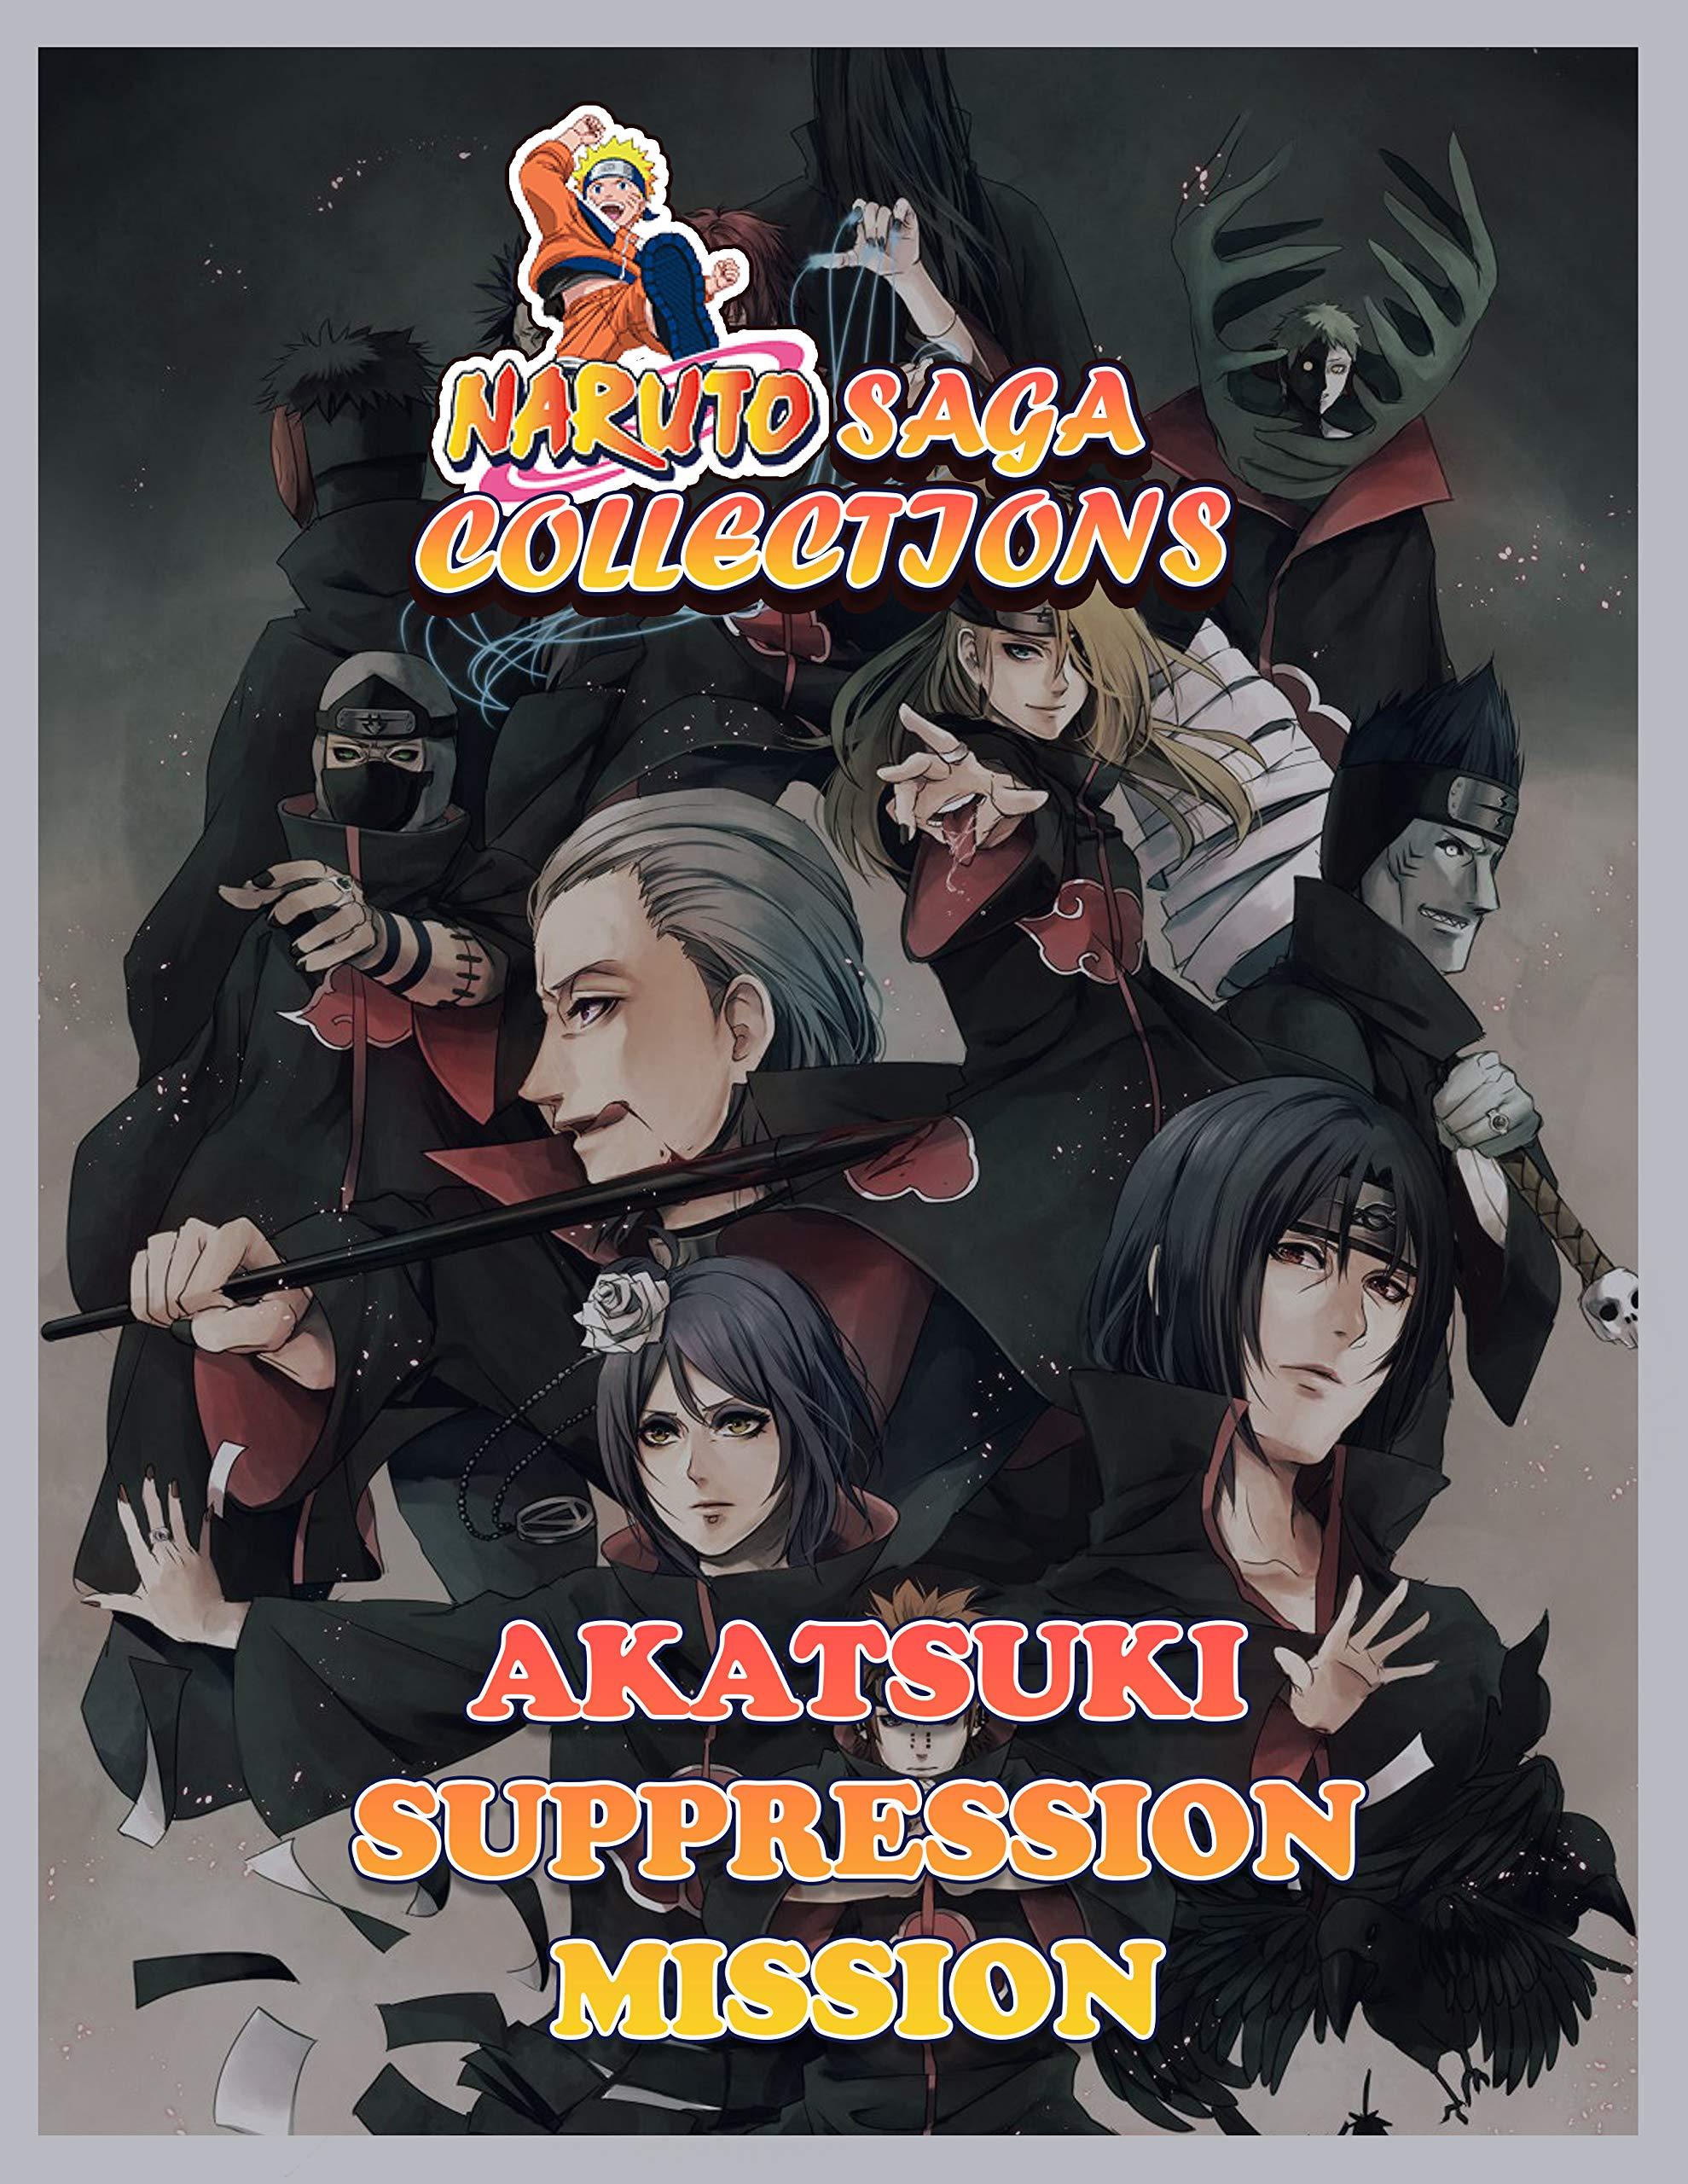 Manga Saga Collections: Naruto Akatsuki Suppression Mission Vol 9